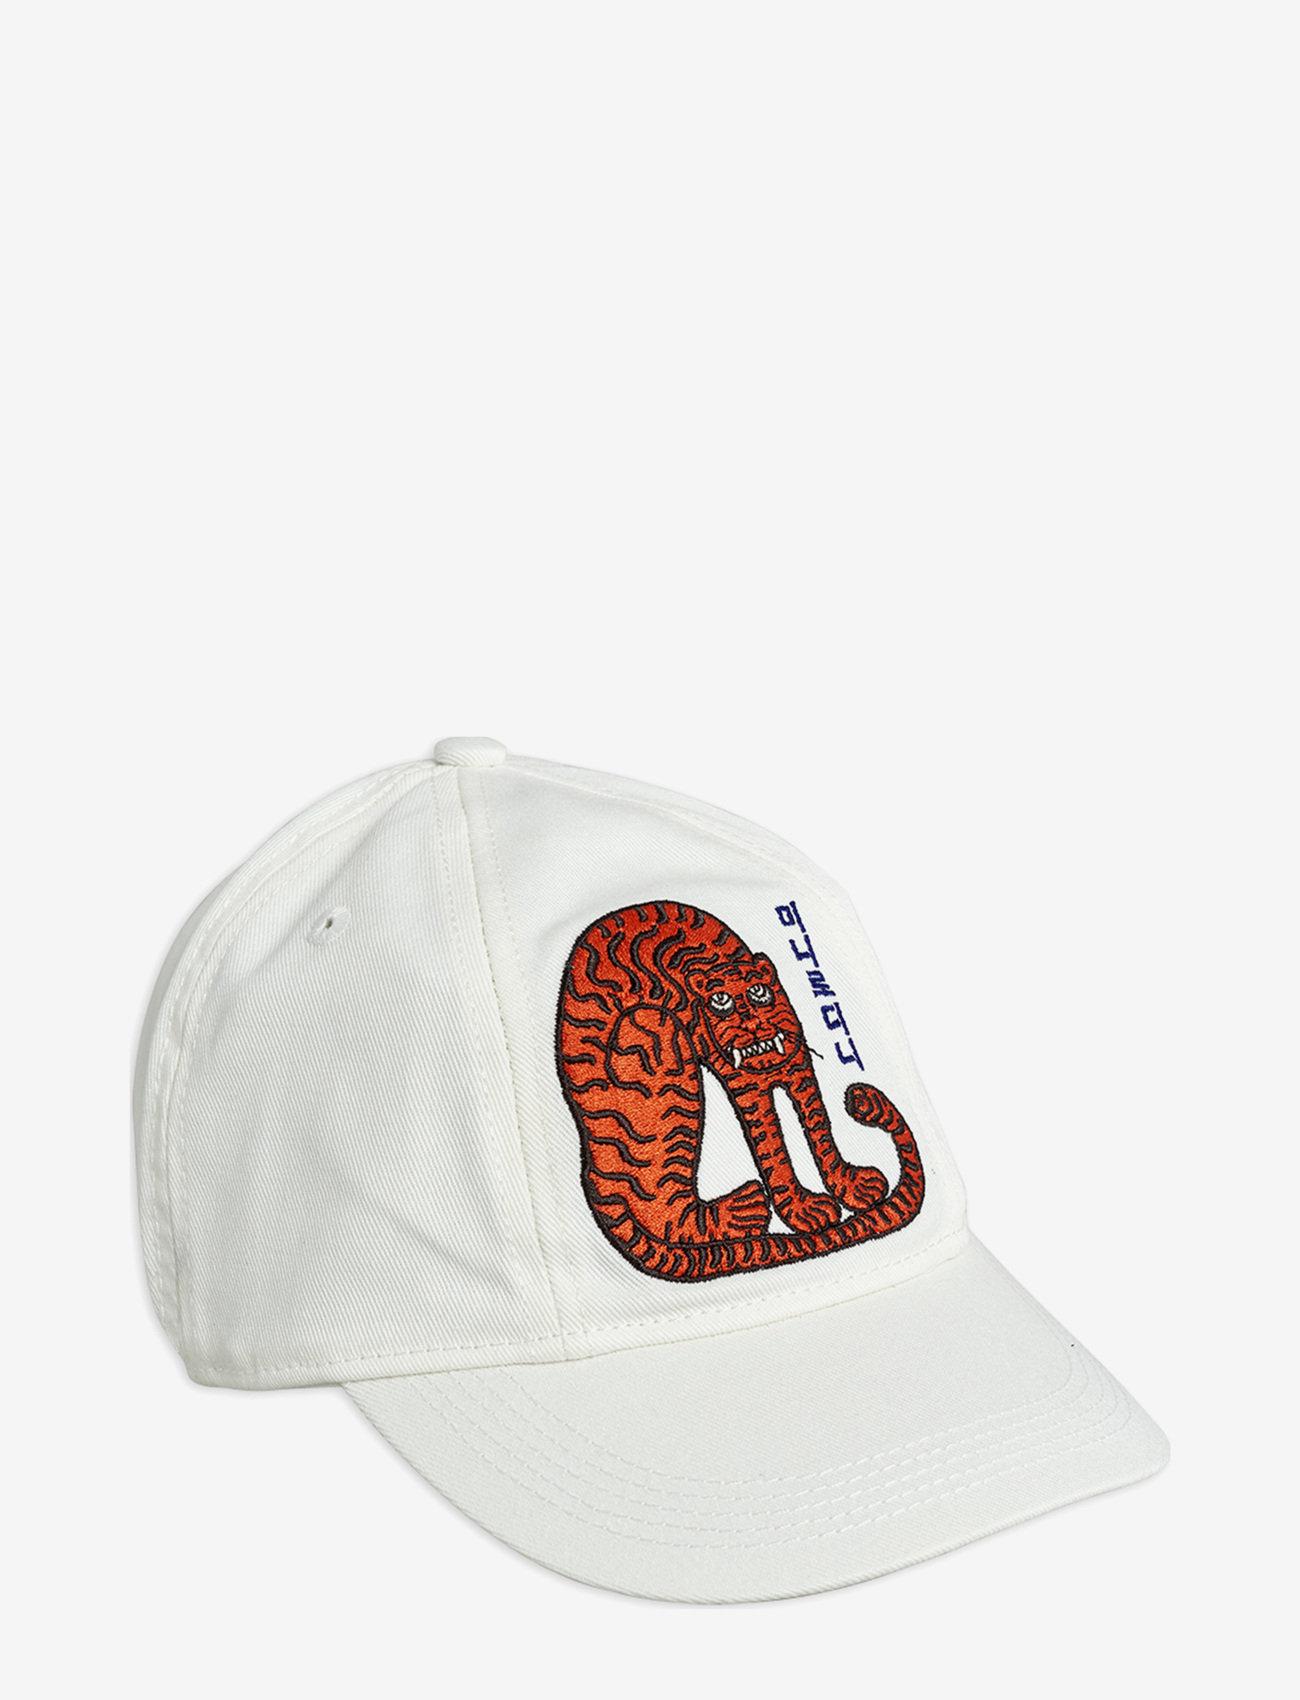 Mini Rodini - Tiger soft cap - mutsen - offwhite - 0